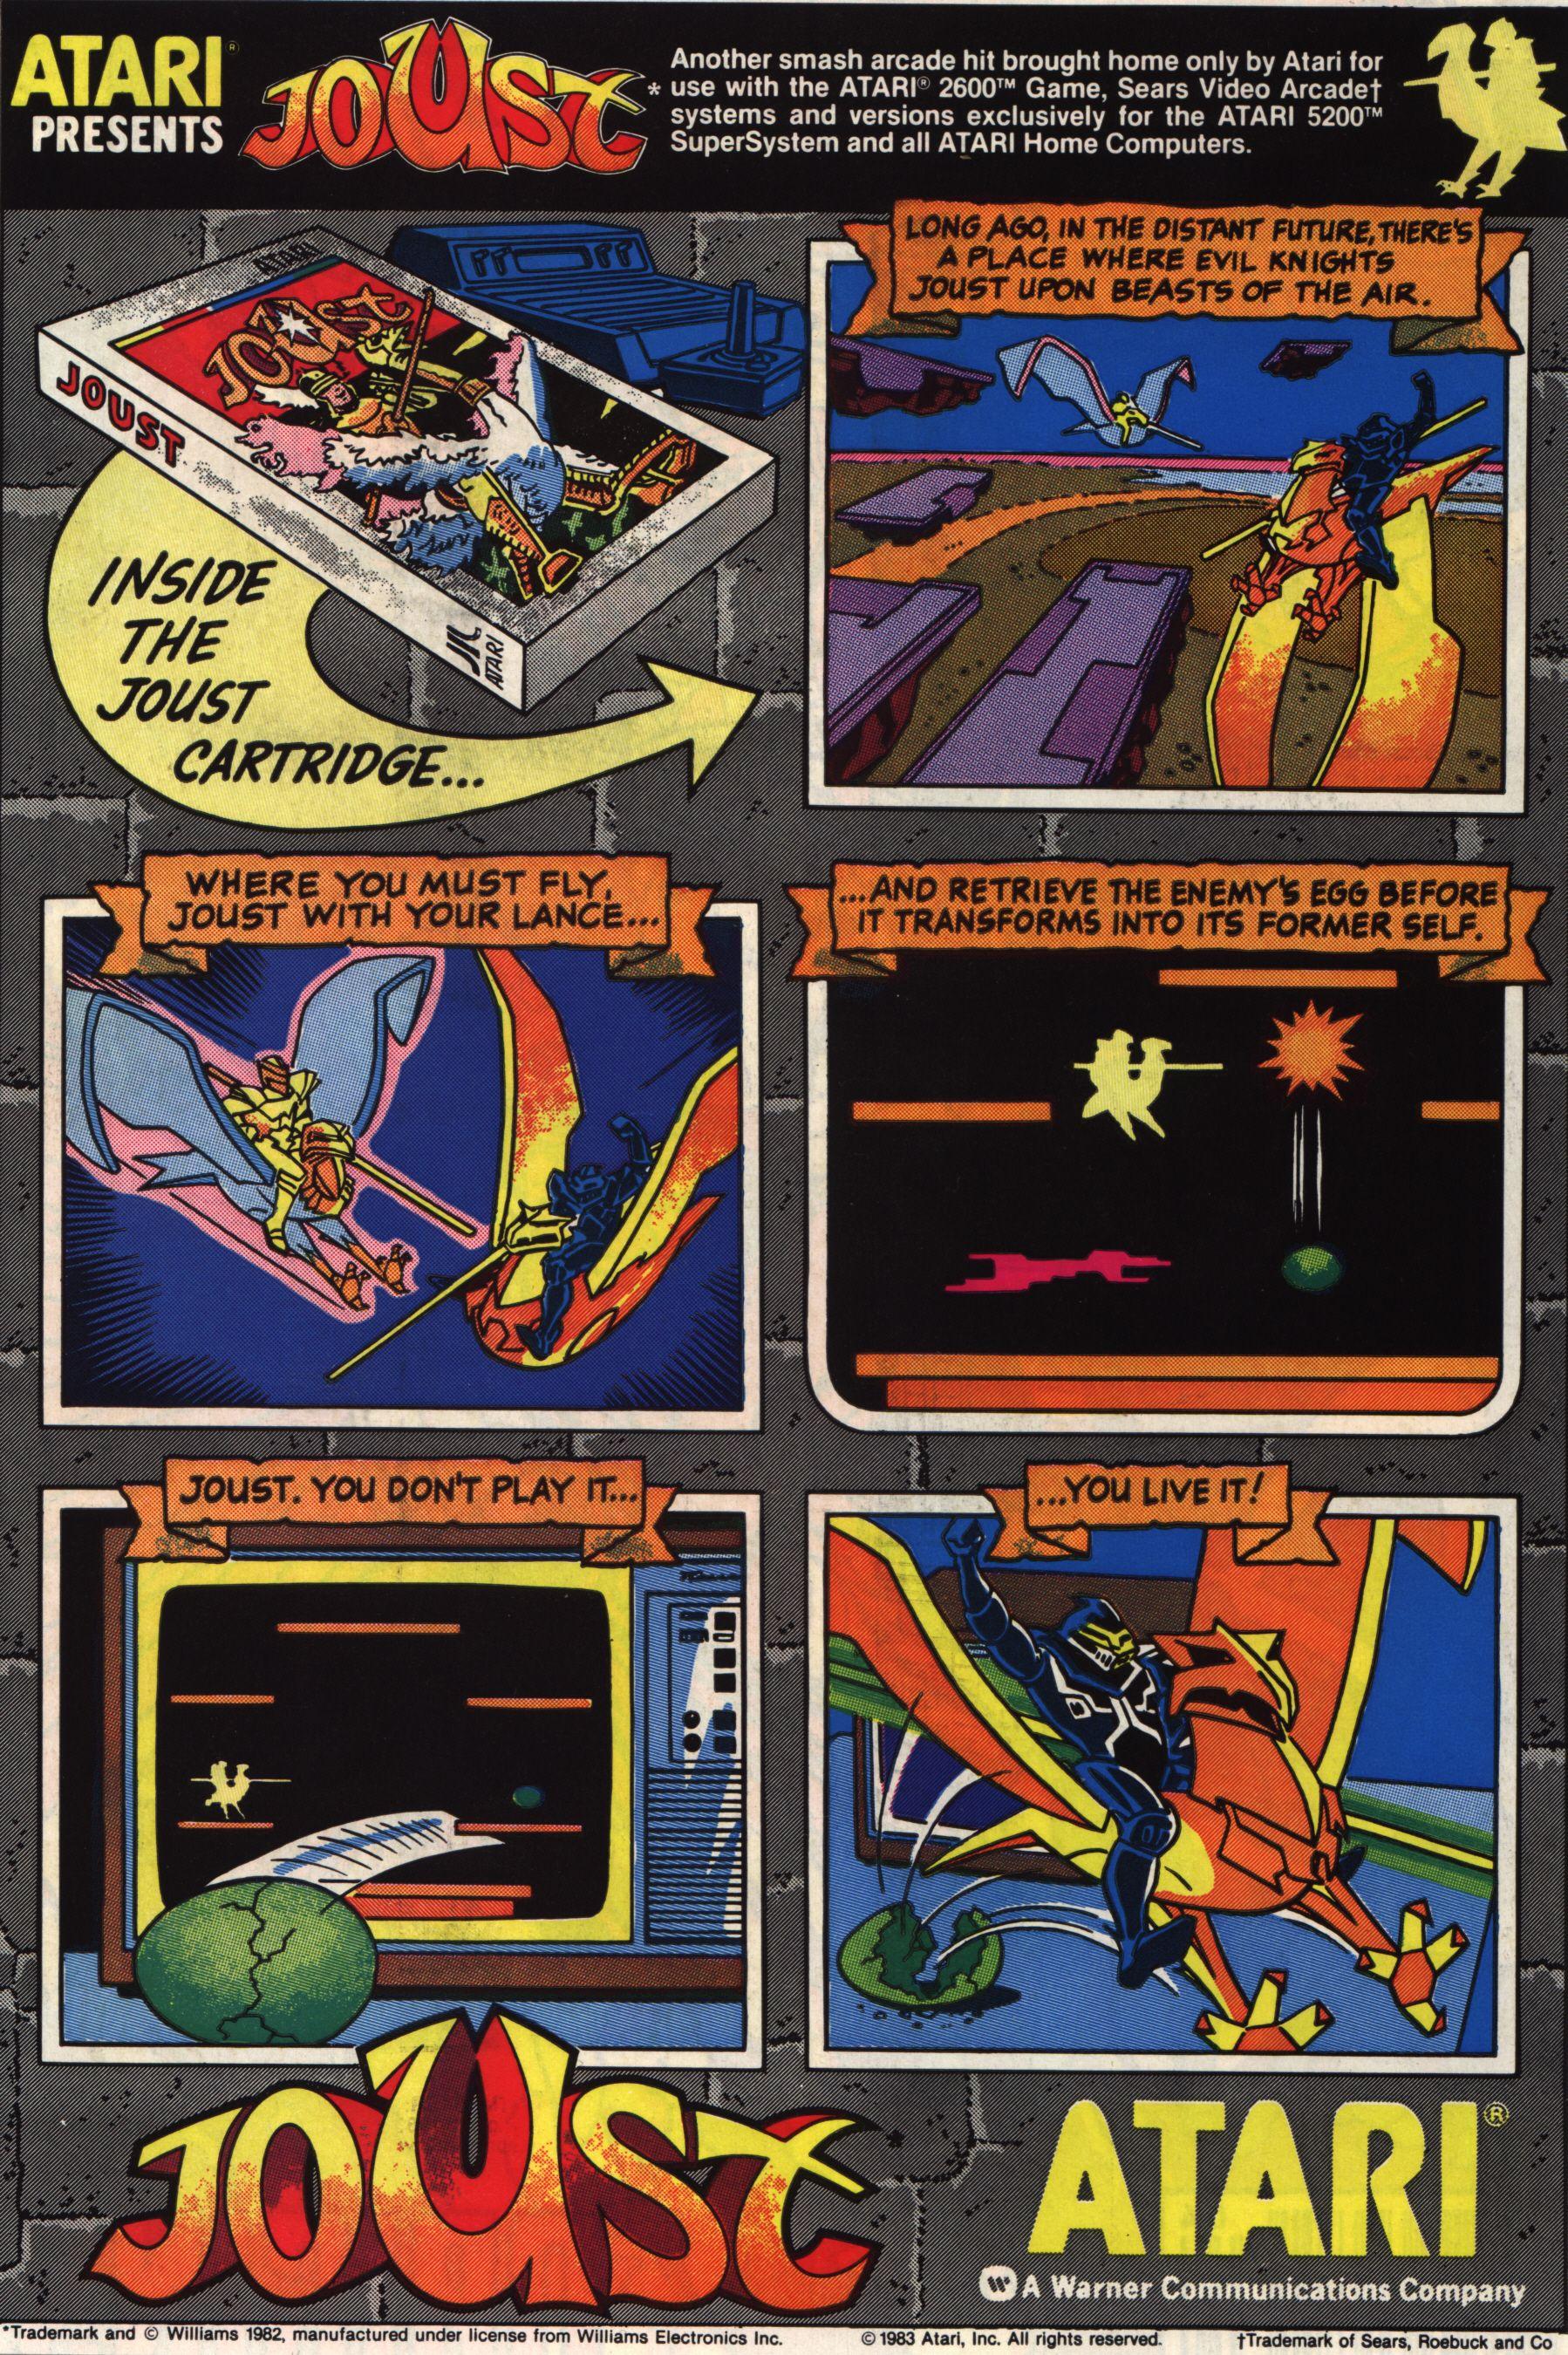 Atari Presents Joust Vintage video games